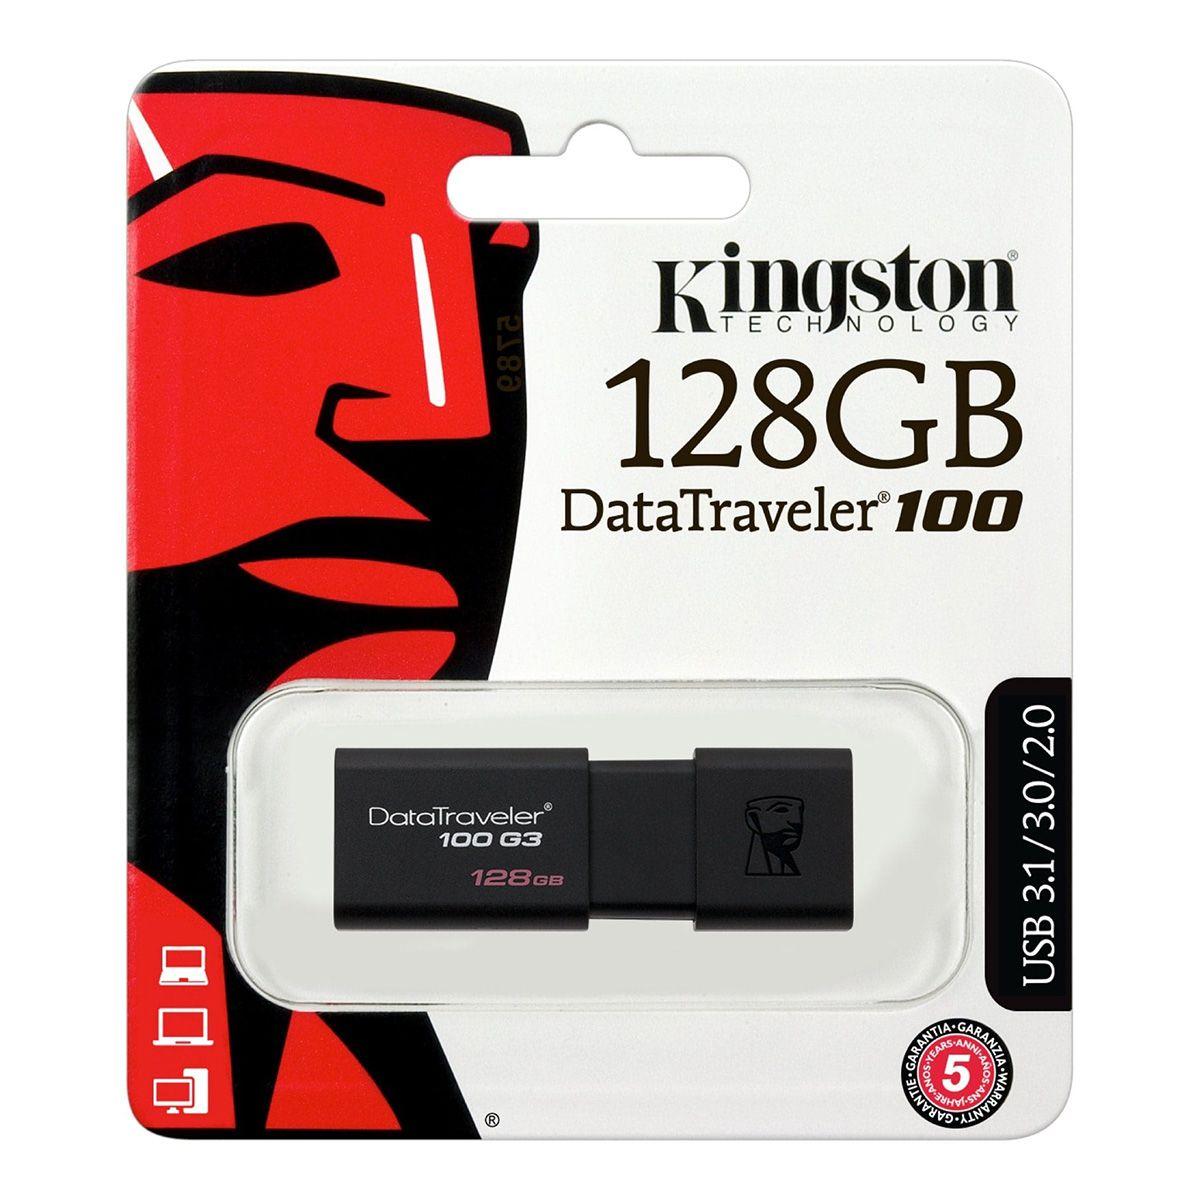 Pendrive Kingston 128GB USB Data Traveler 100G3